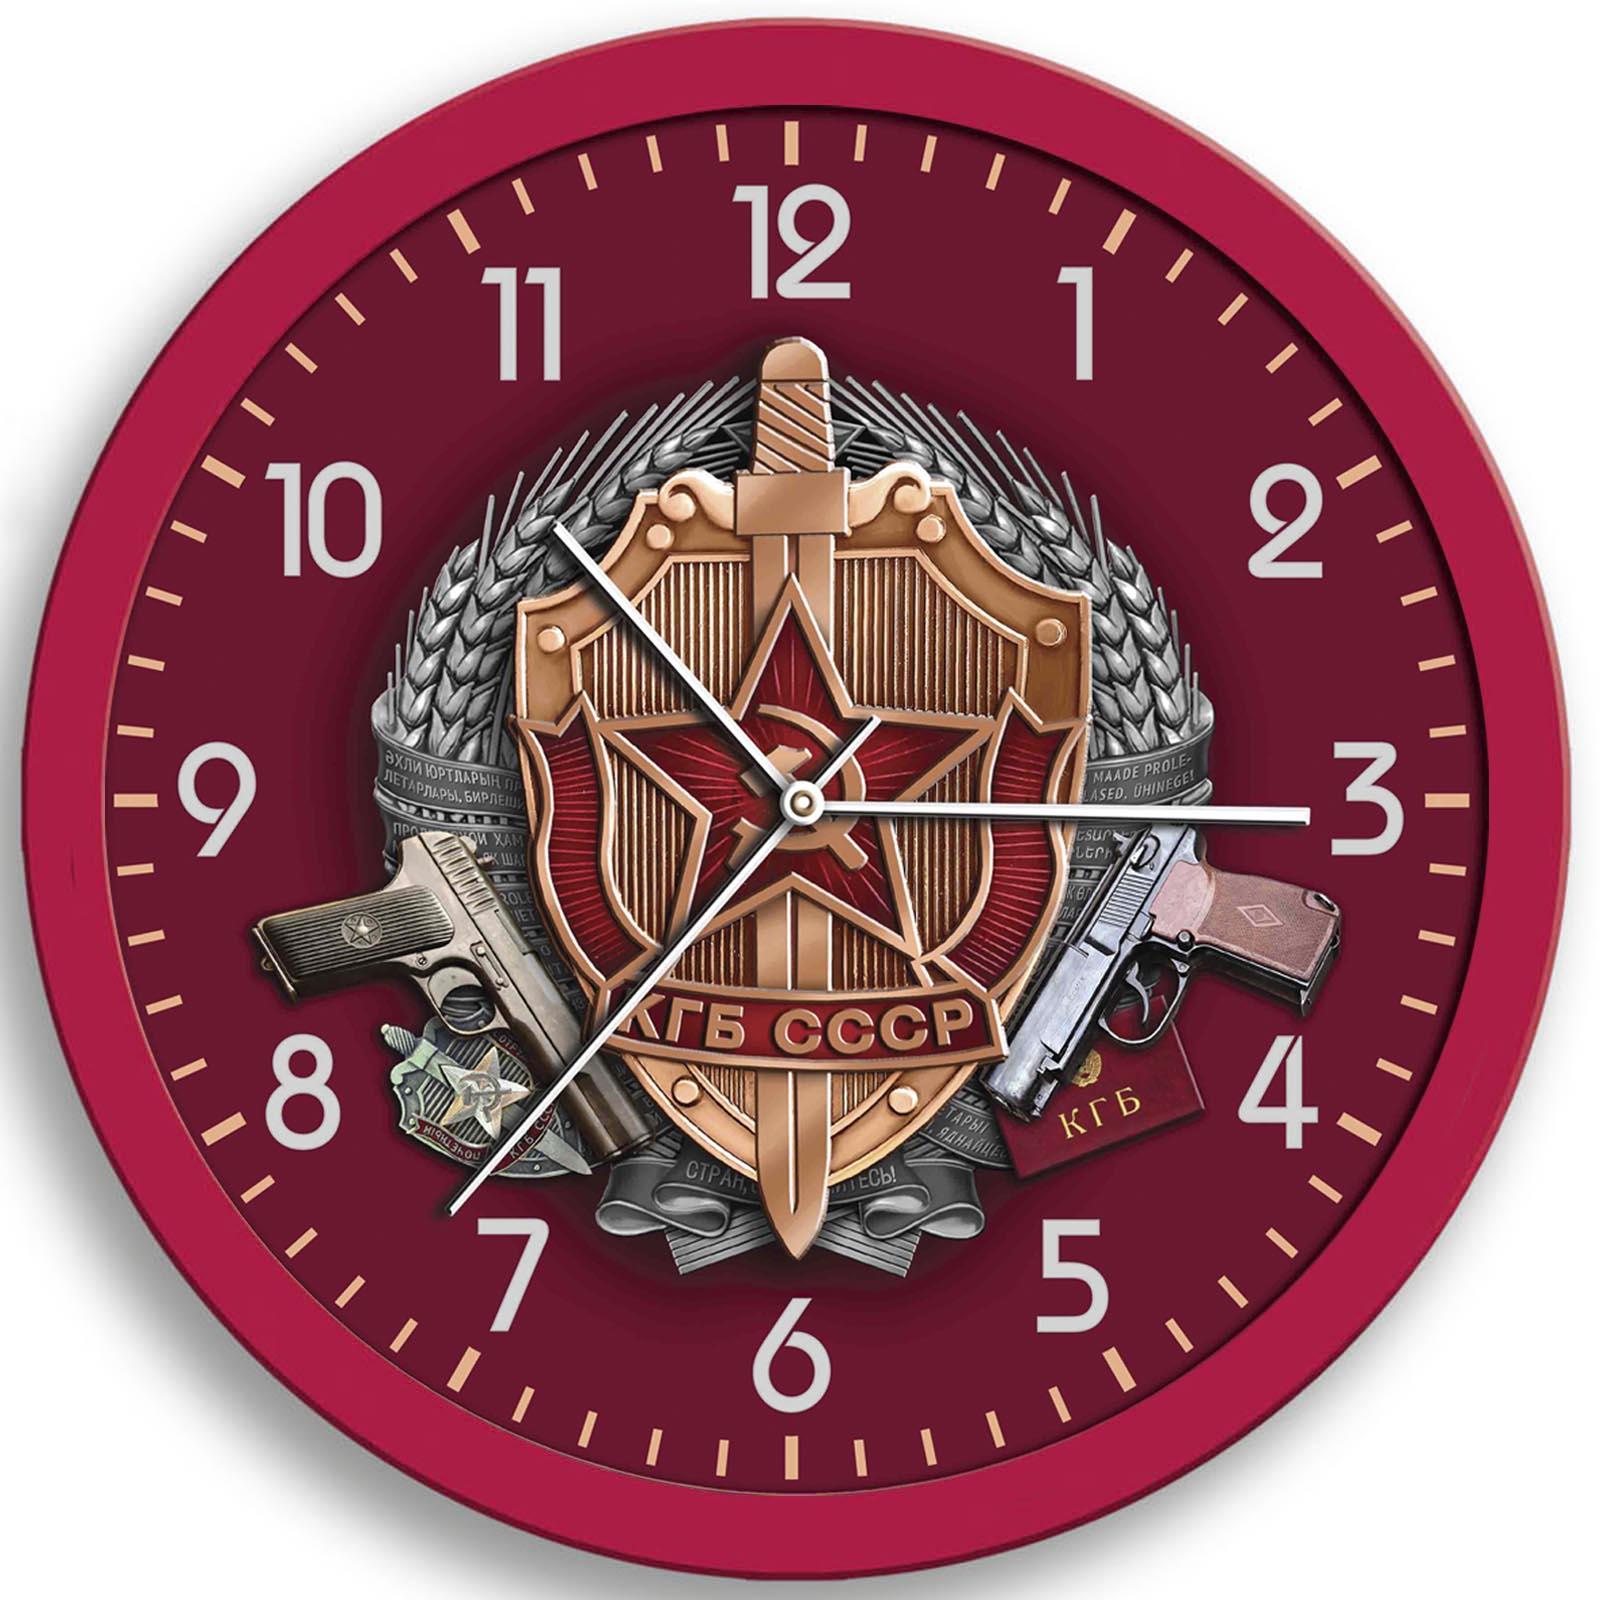 Настенные часы КГБ СССР